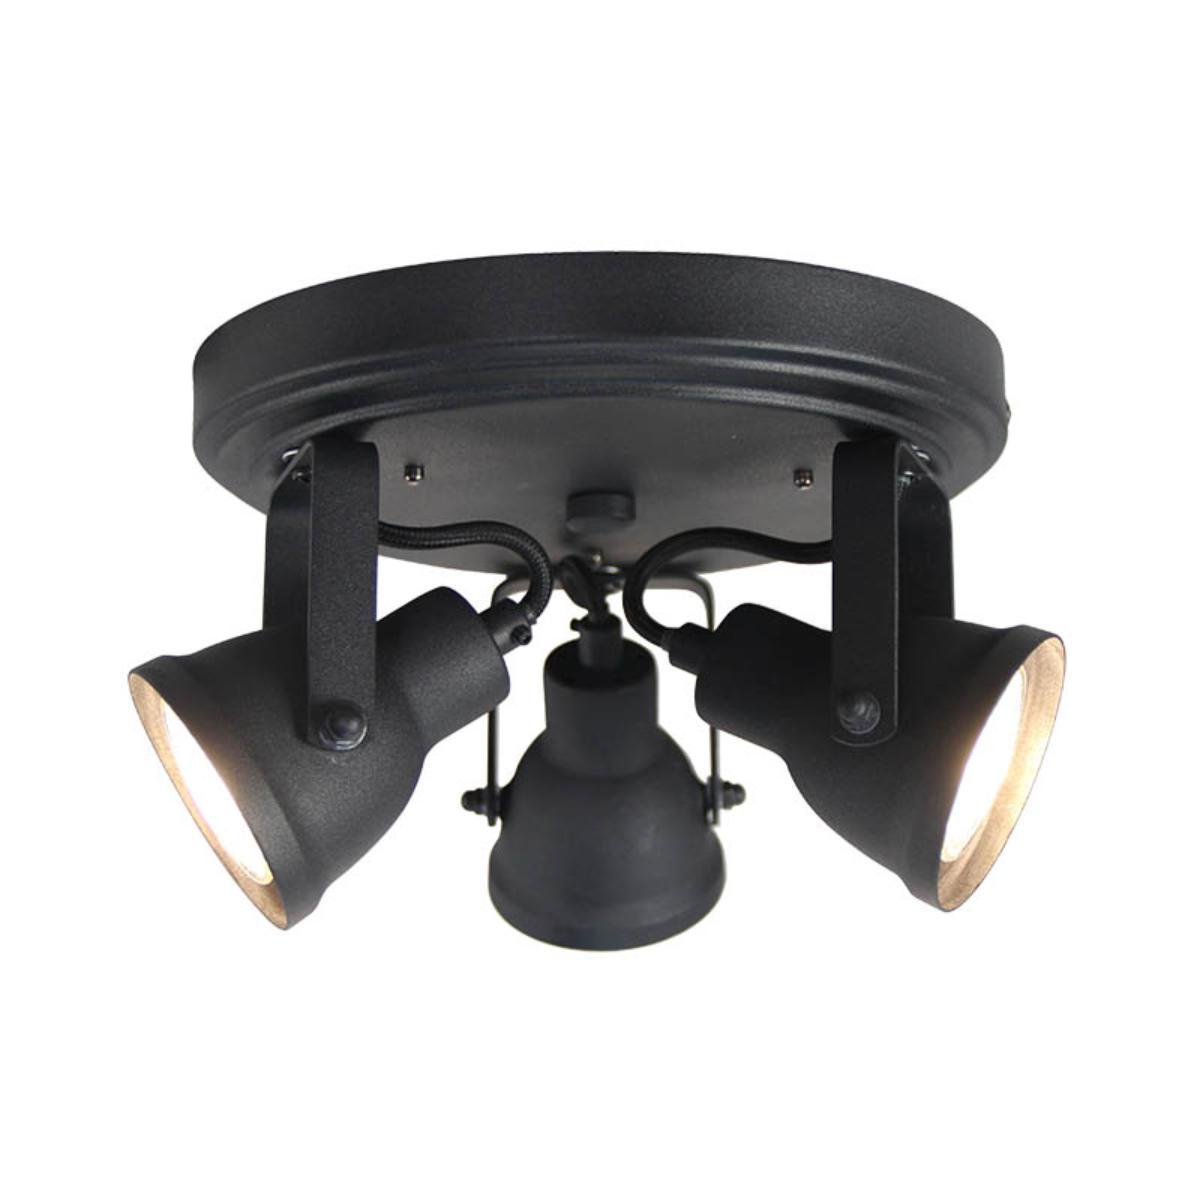 LABEL51 Spot Max led - Zwart - Metaal - 3 Lichts